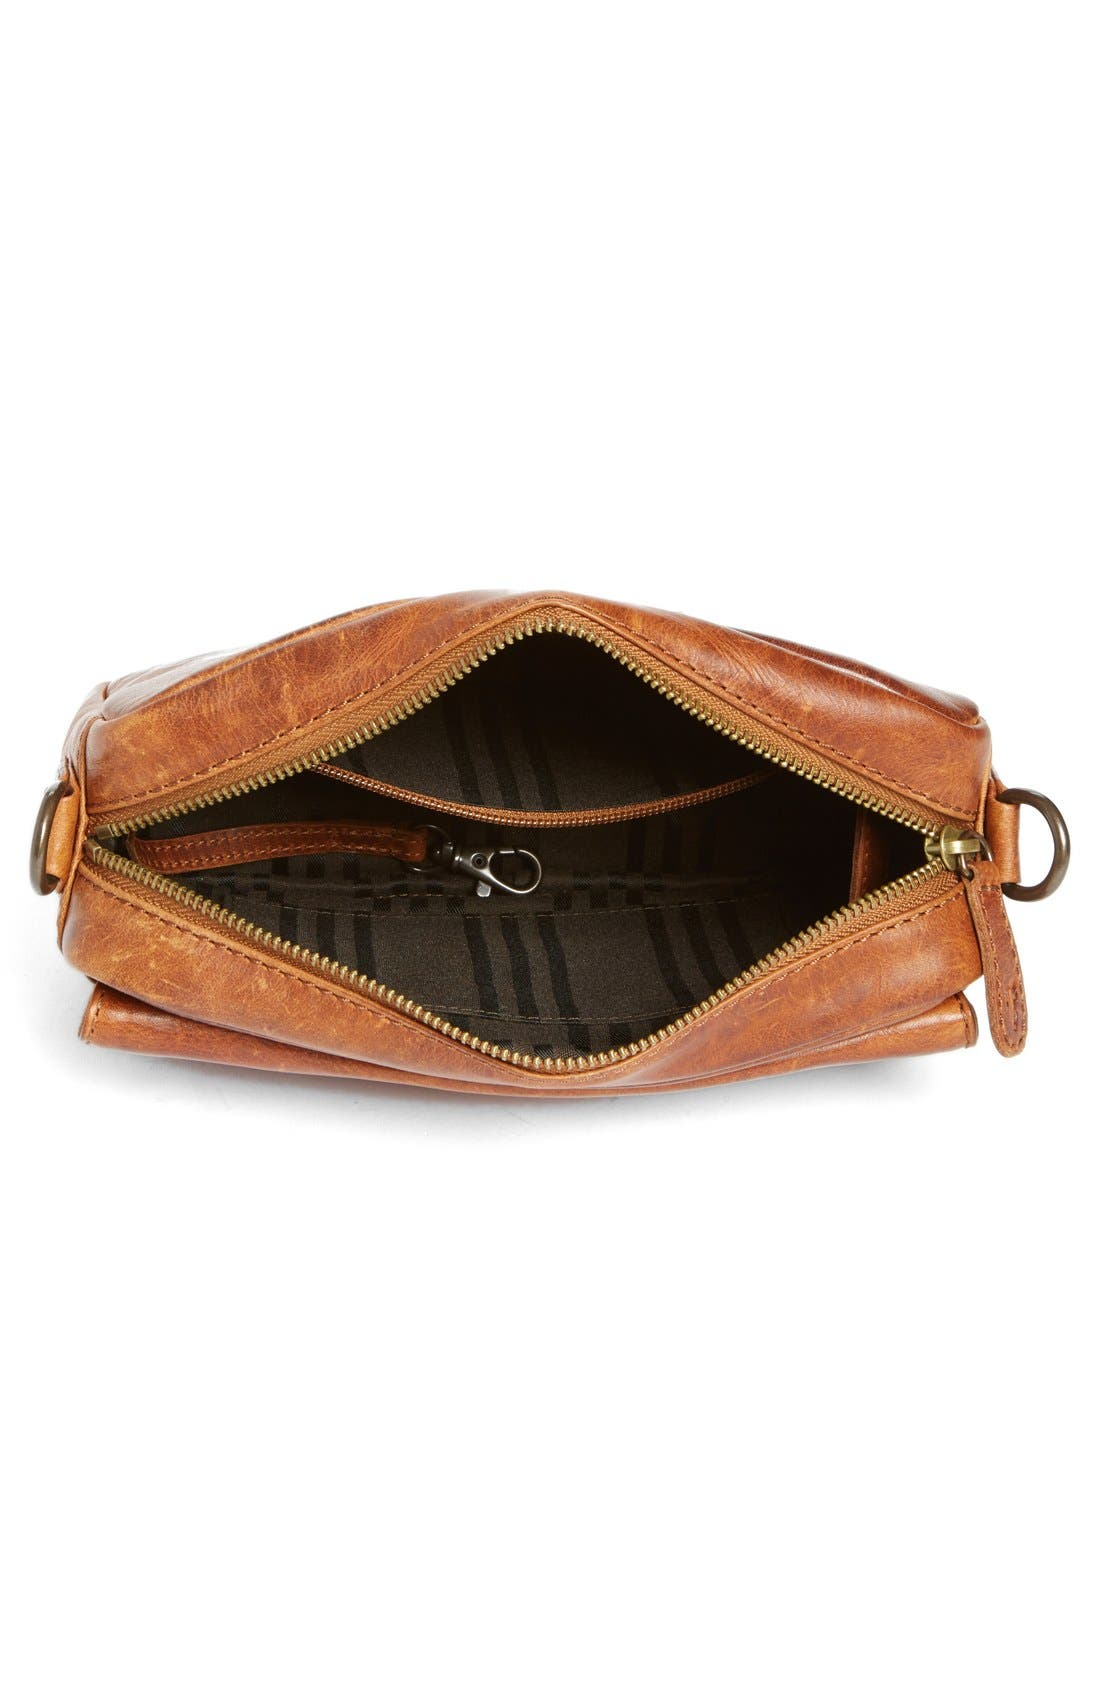 'Melissa' Leather Camera Crossbody Bag,                             Alternate thumbnail 4, color,                             200